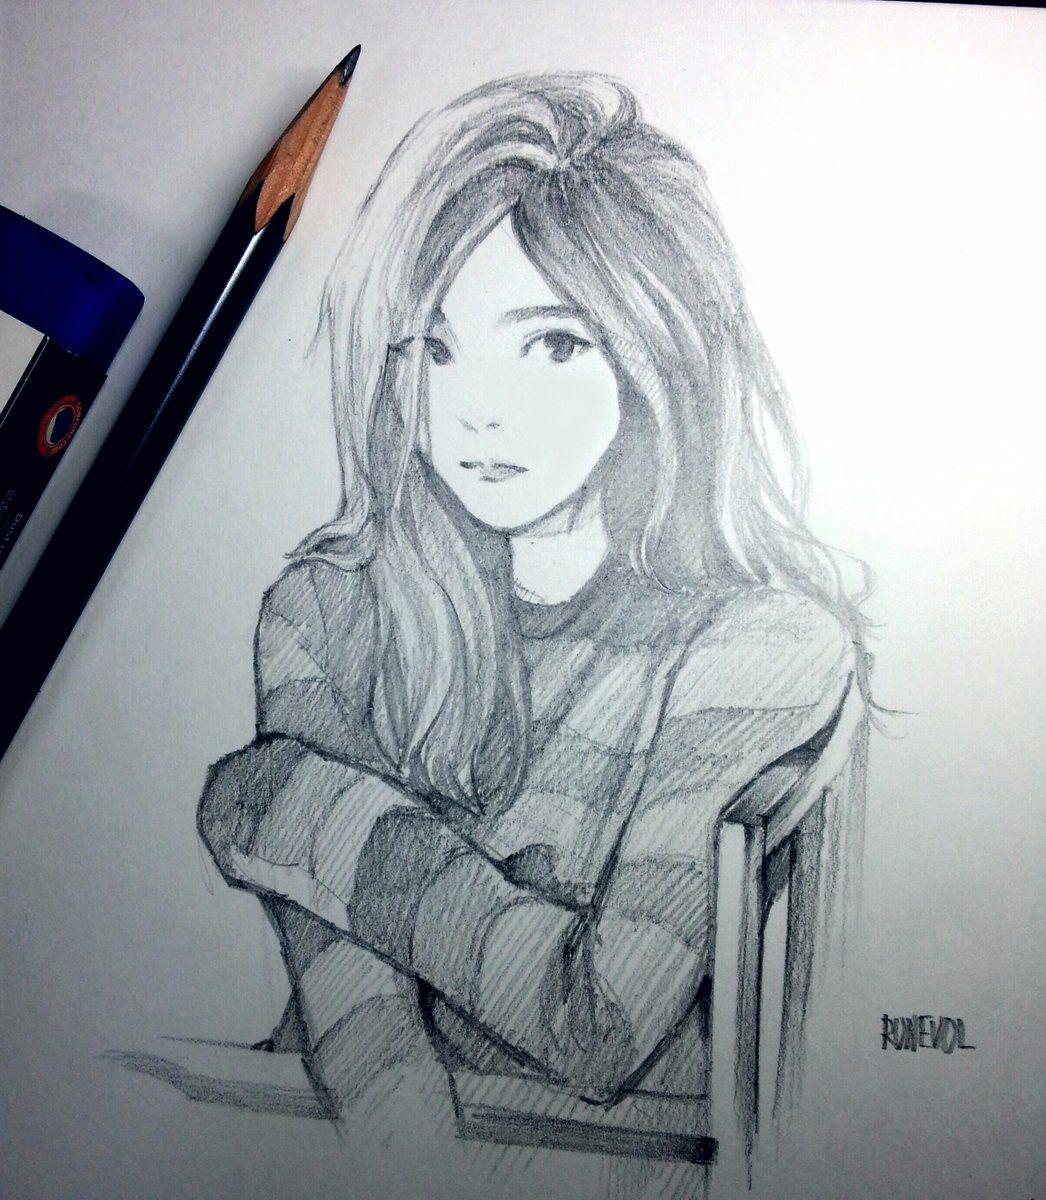 Fan art of taeyeon 태연 of girls generation 소녀시대 from her music video 1111